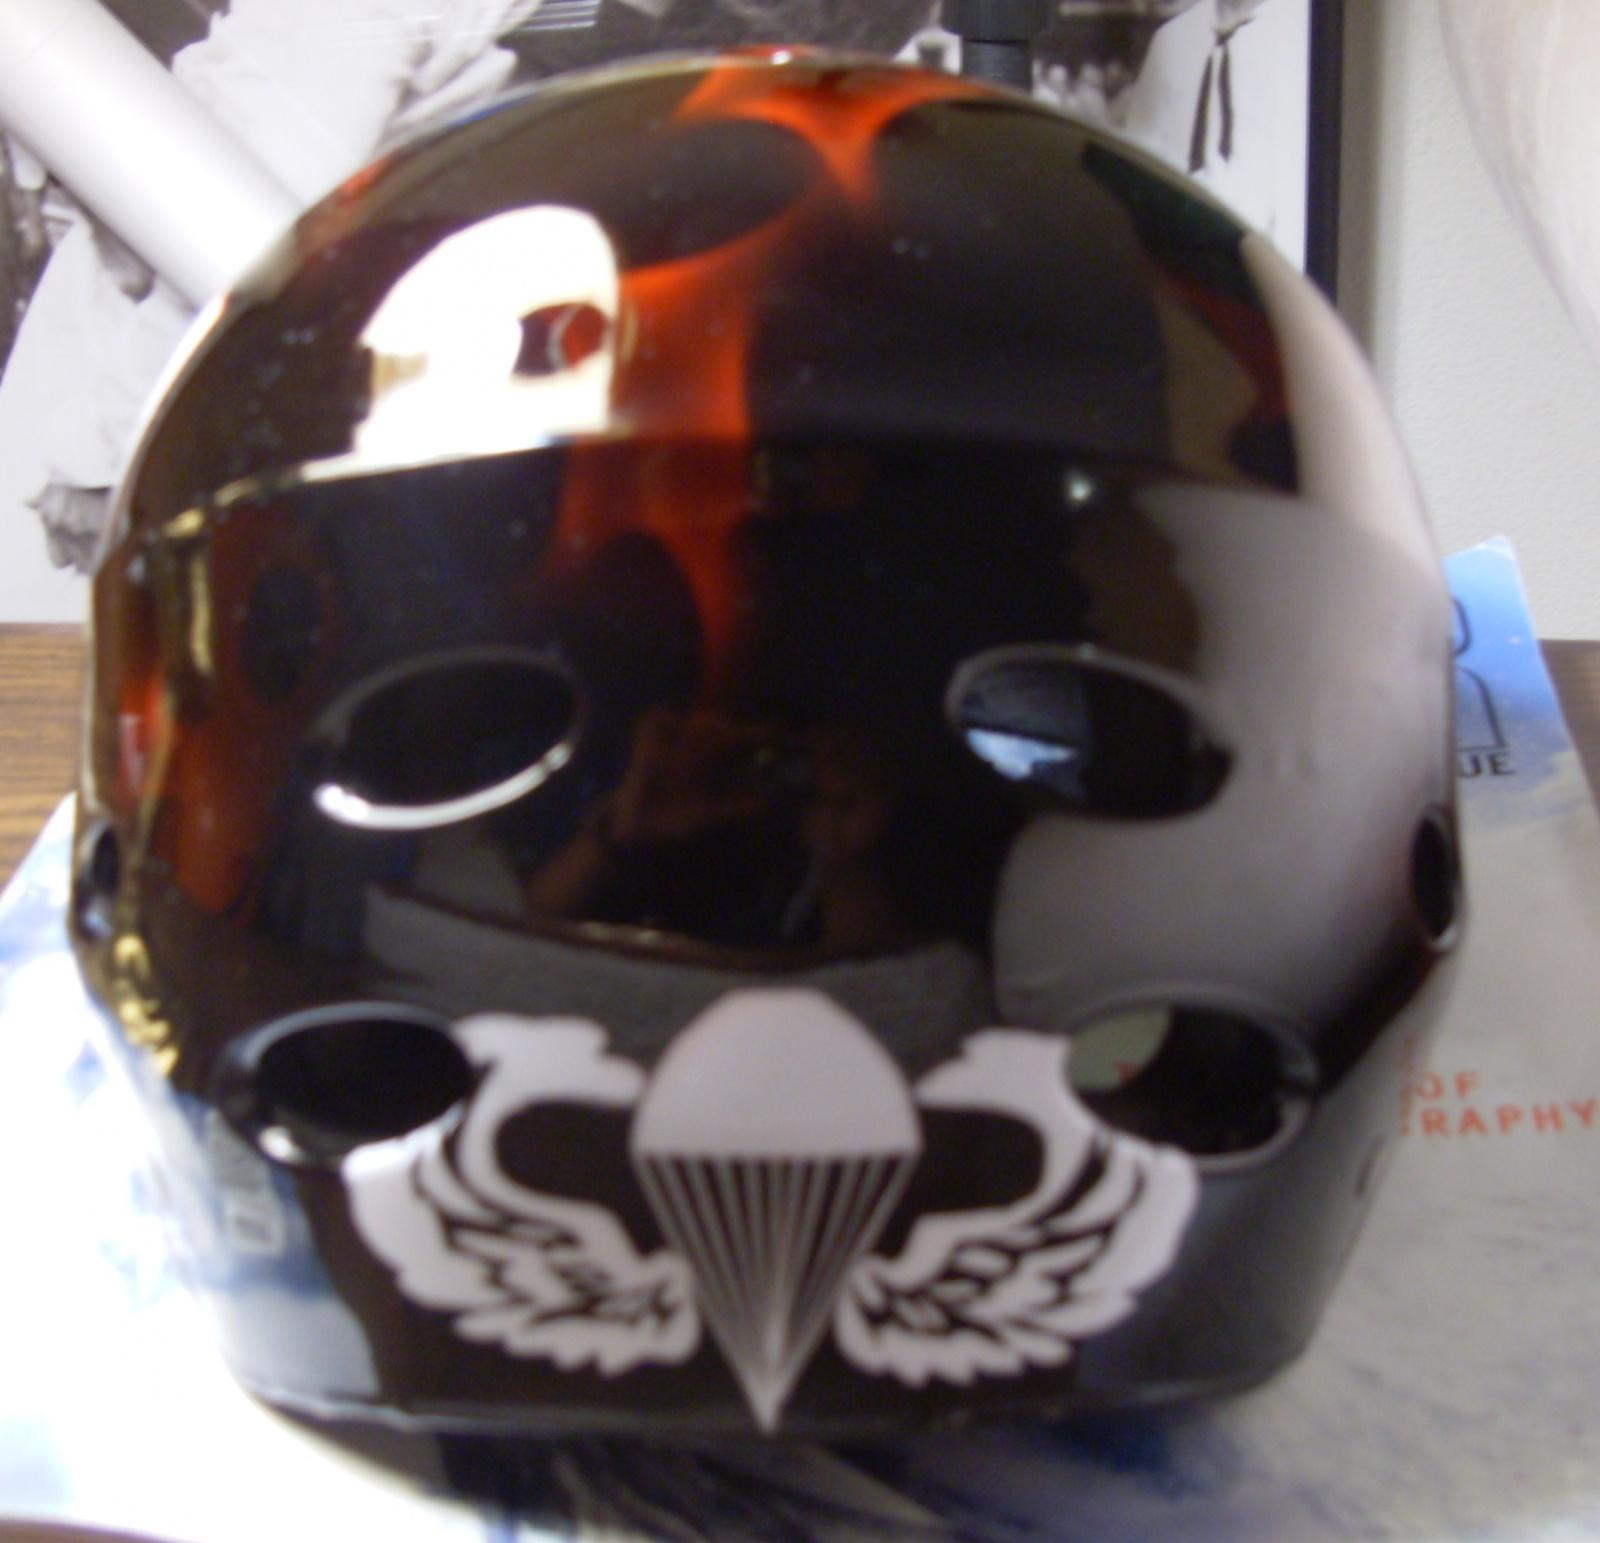 Click image for larger version  Name:Custom kayak helmet 018.jpg Views:304 Size:426.9 KB ID:846